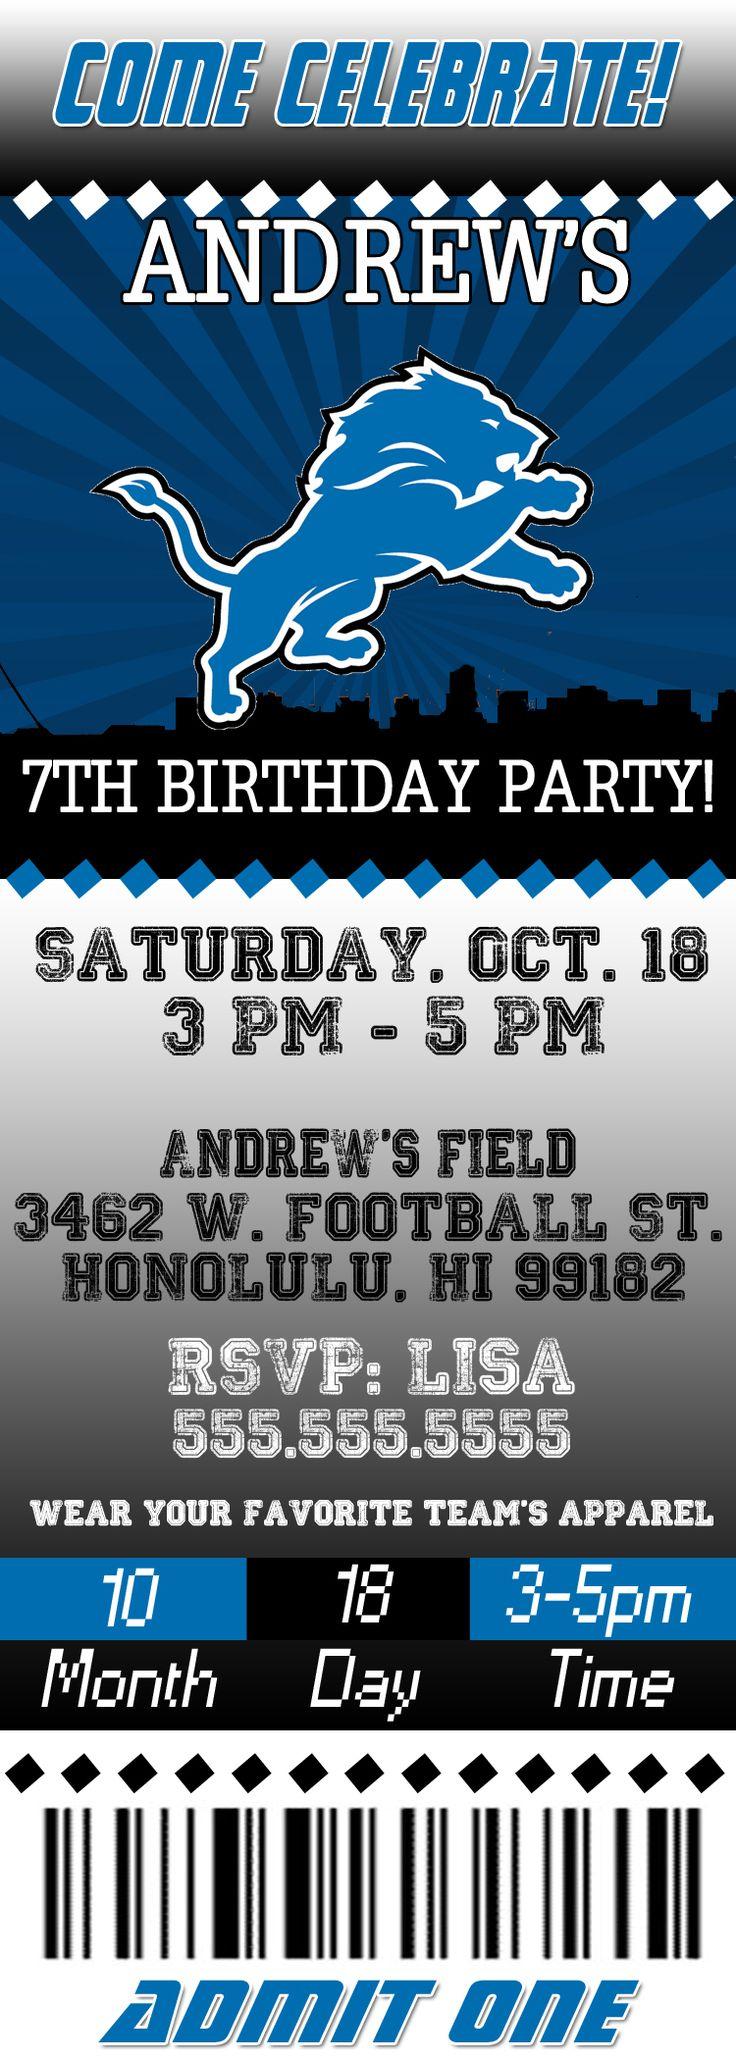 NFL Detroit Lions  Ticket Birthday Invitation https://www.fanprint.com/licenses/detroit-lions?ref=5750